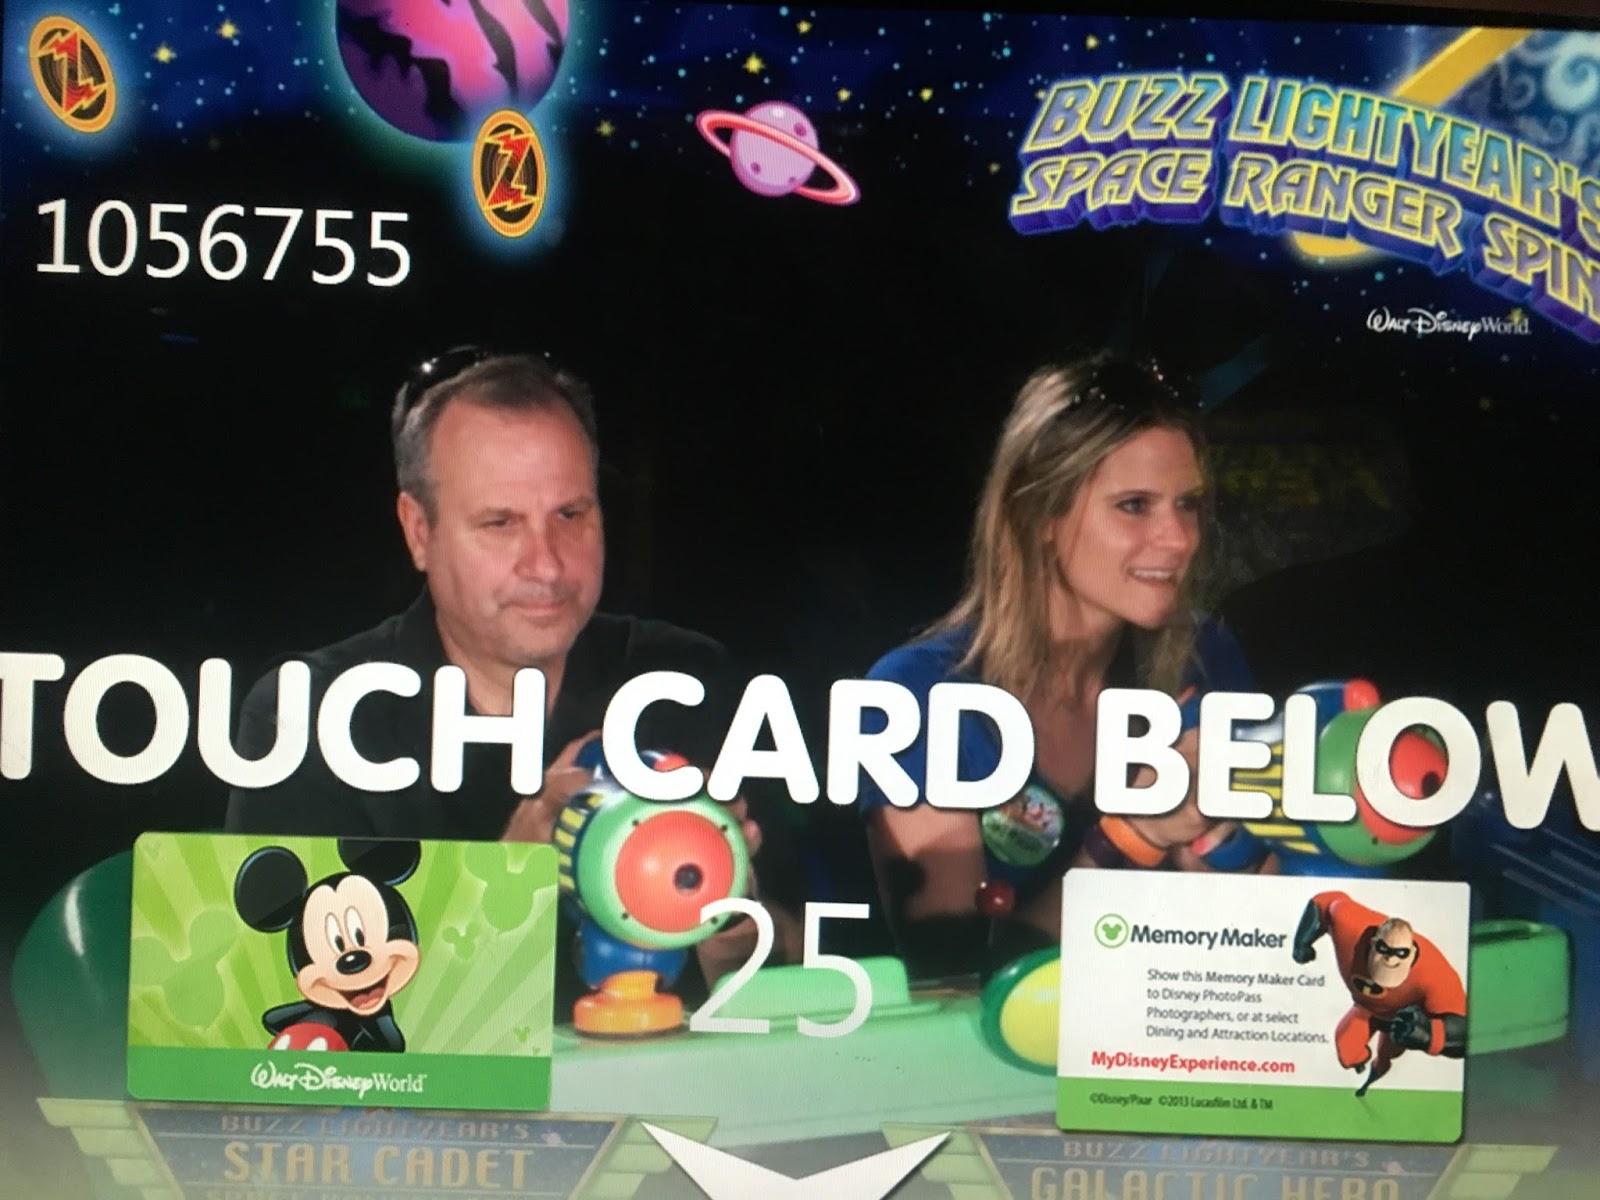 Buzz Lightyear ride at Magic Kingdom in Disney World, Florida